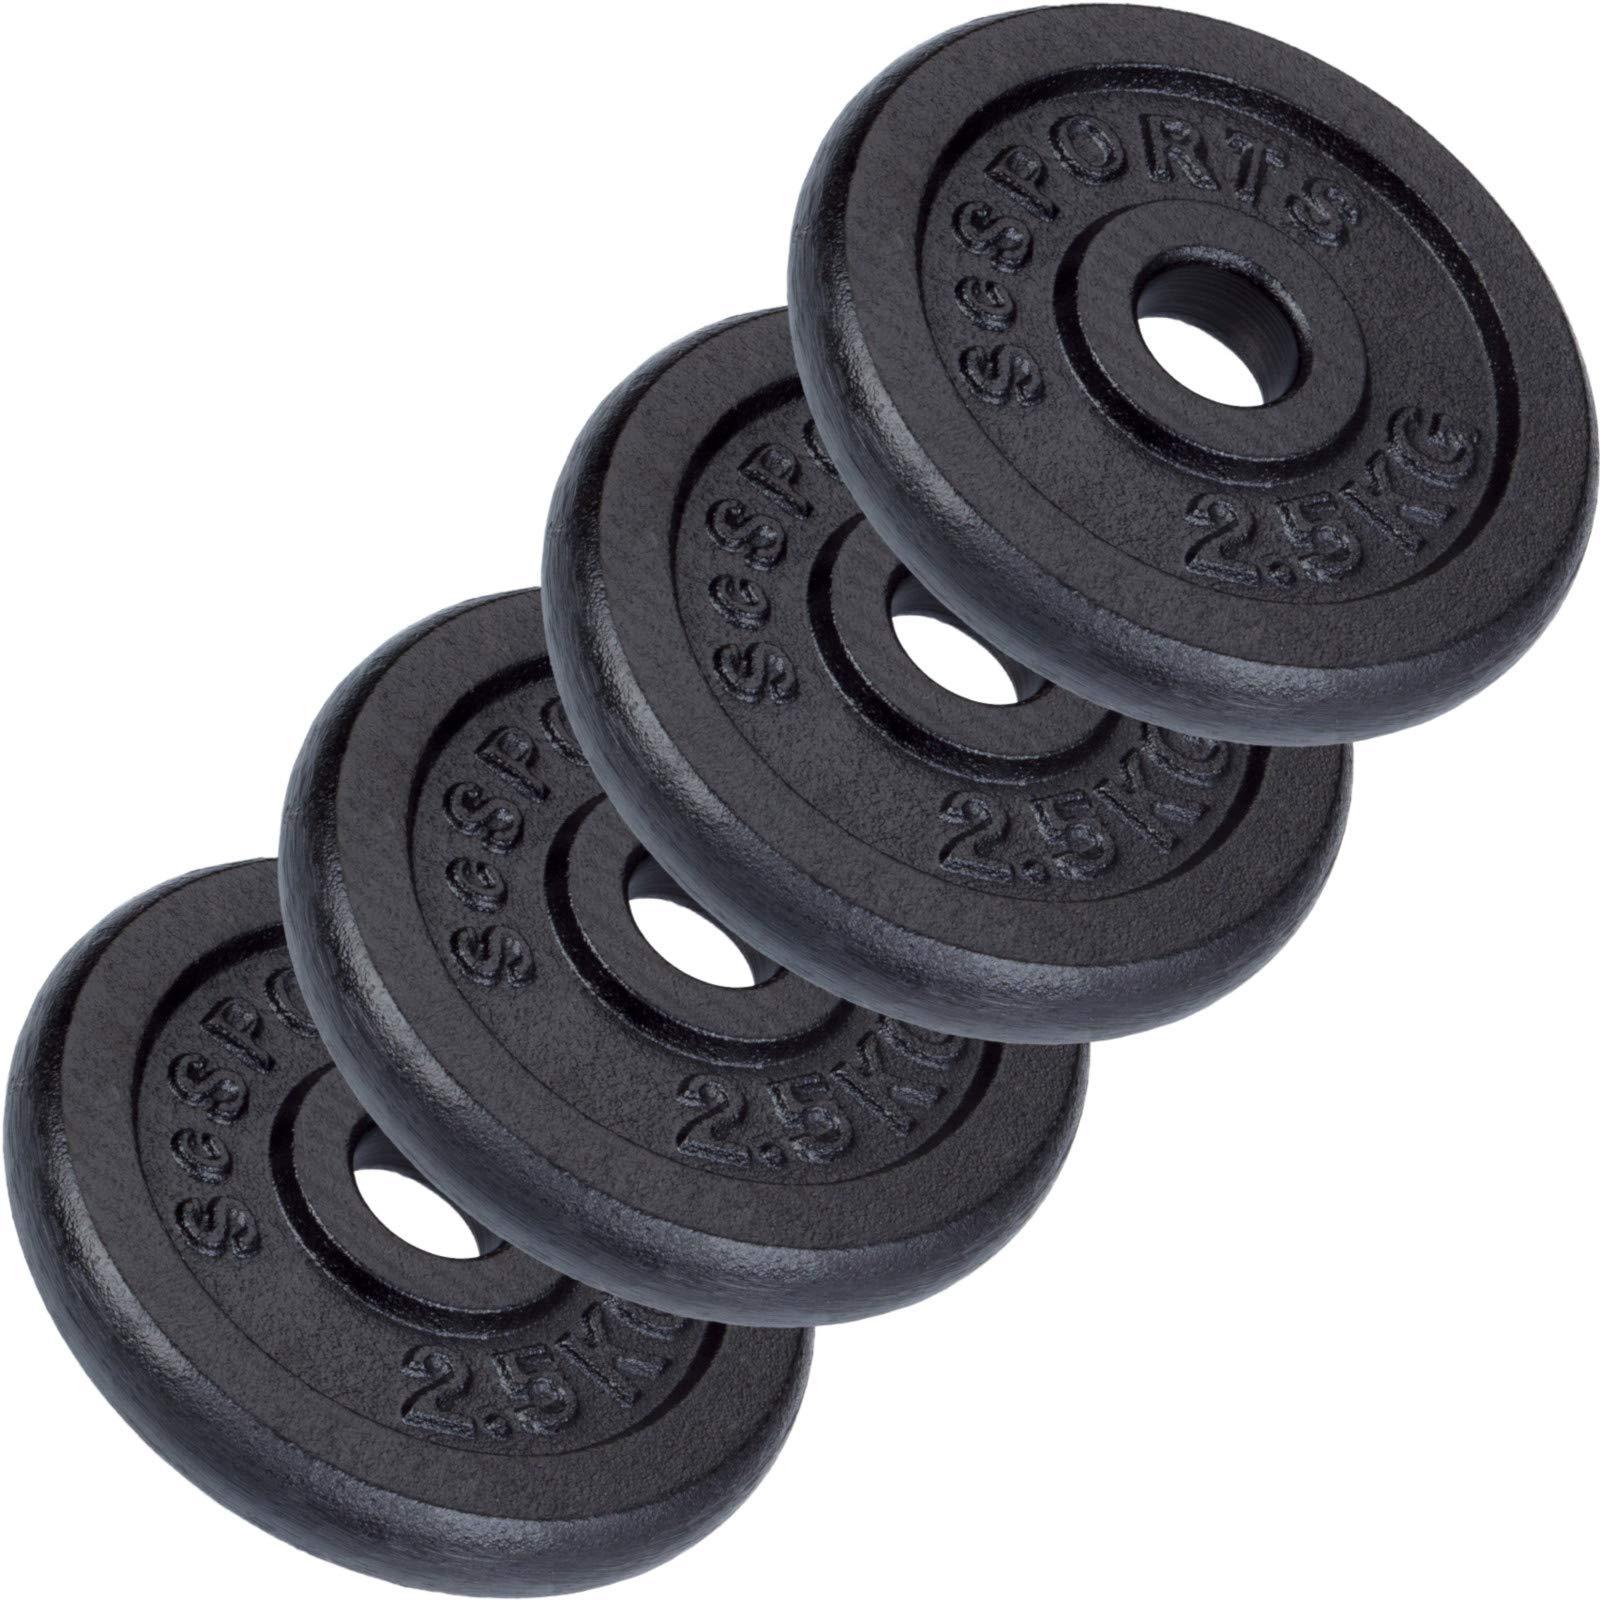 ScSPORTS - Pesas en forma de disco, 4 unidades de 2,5kg